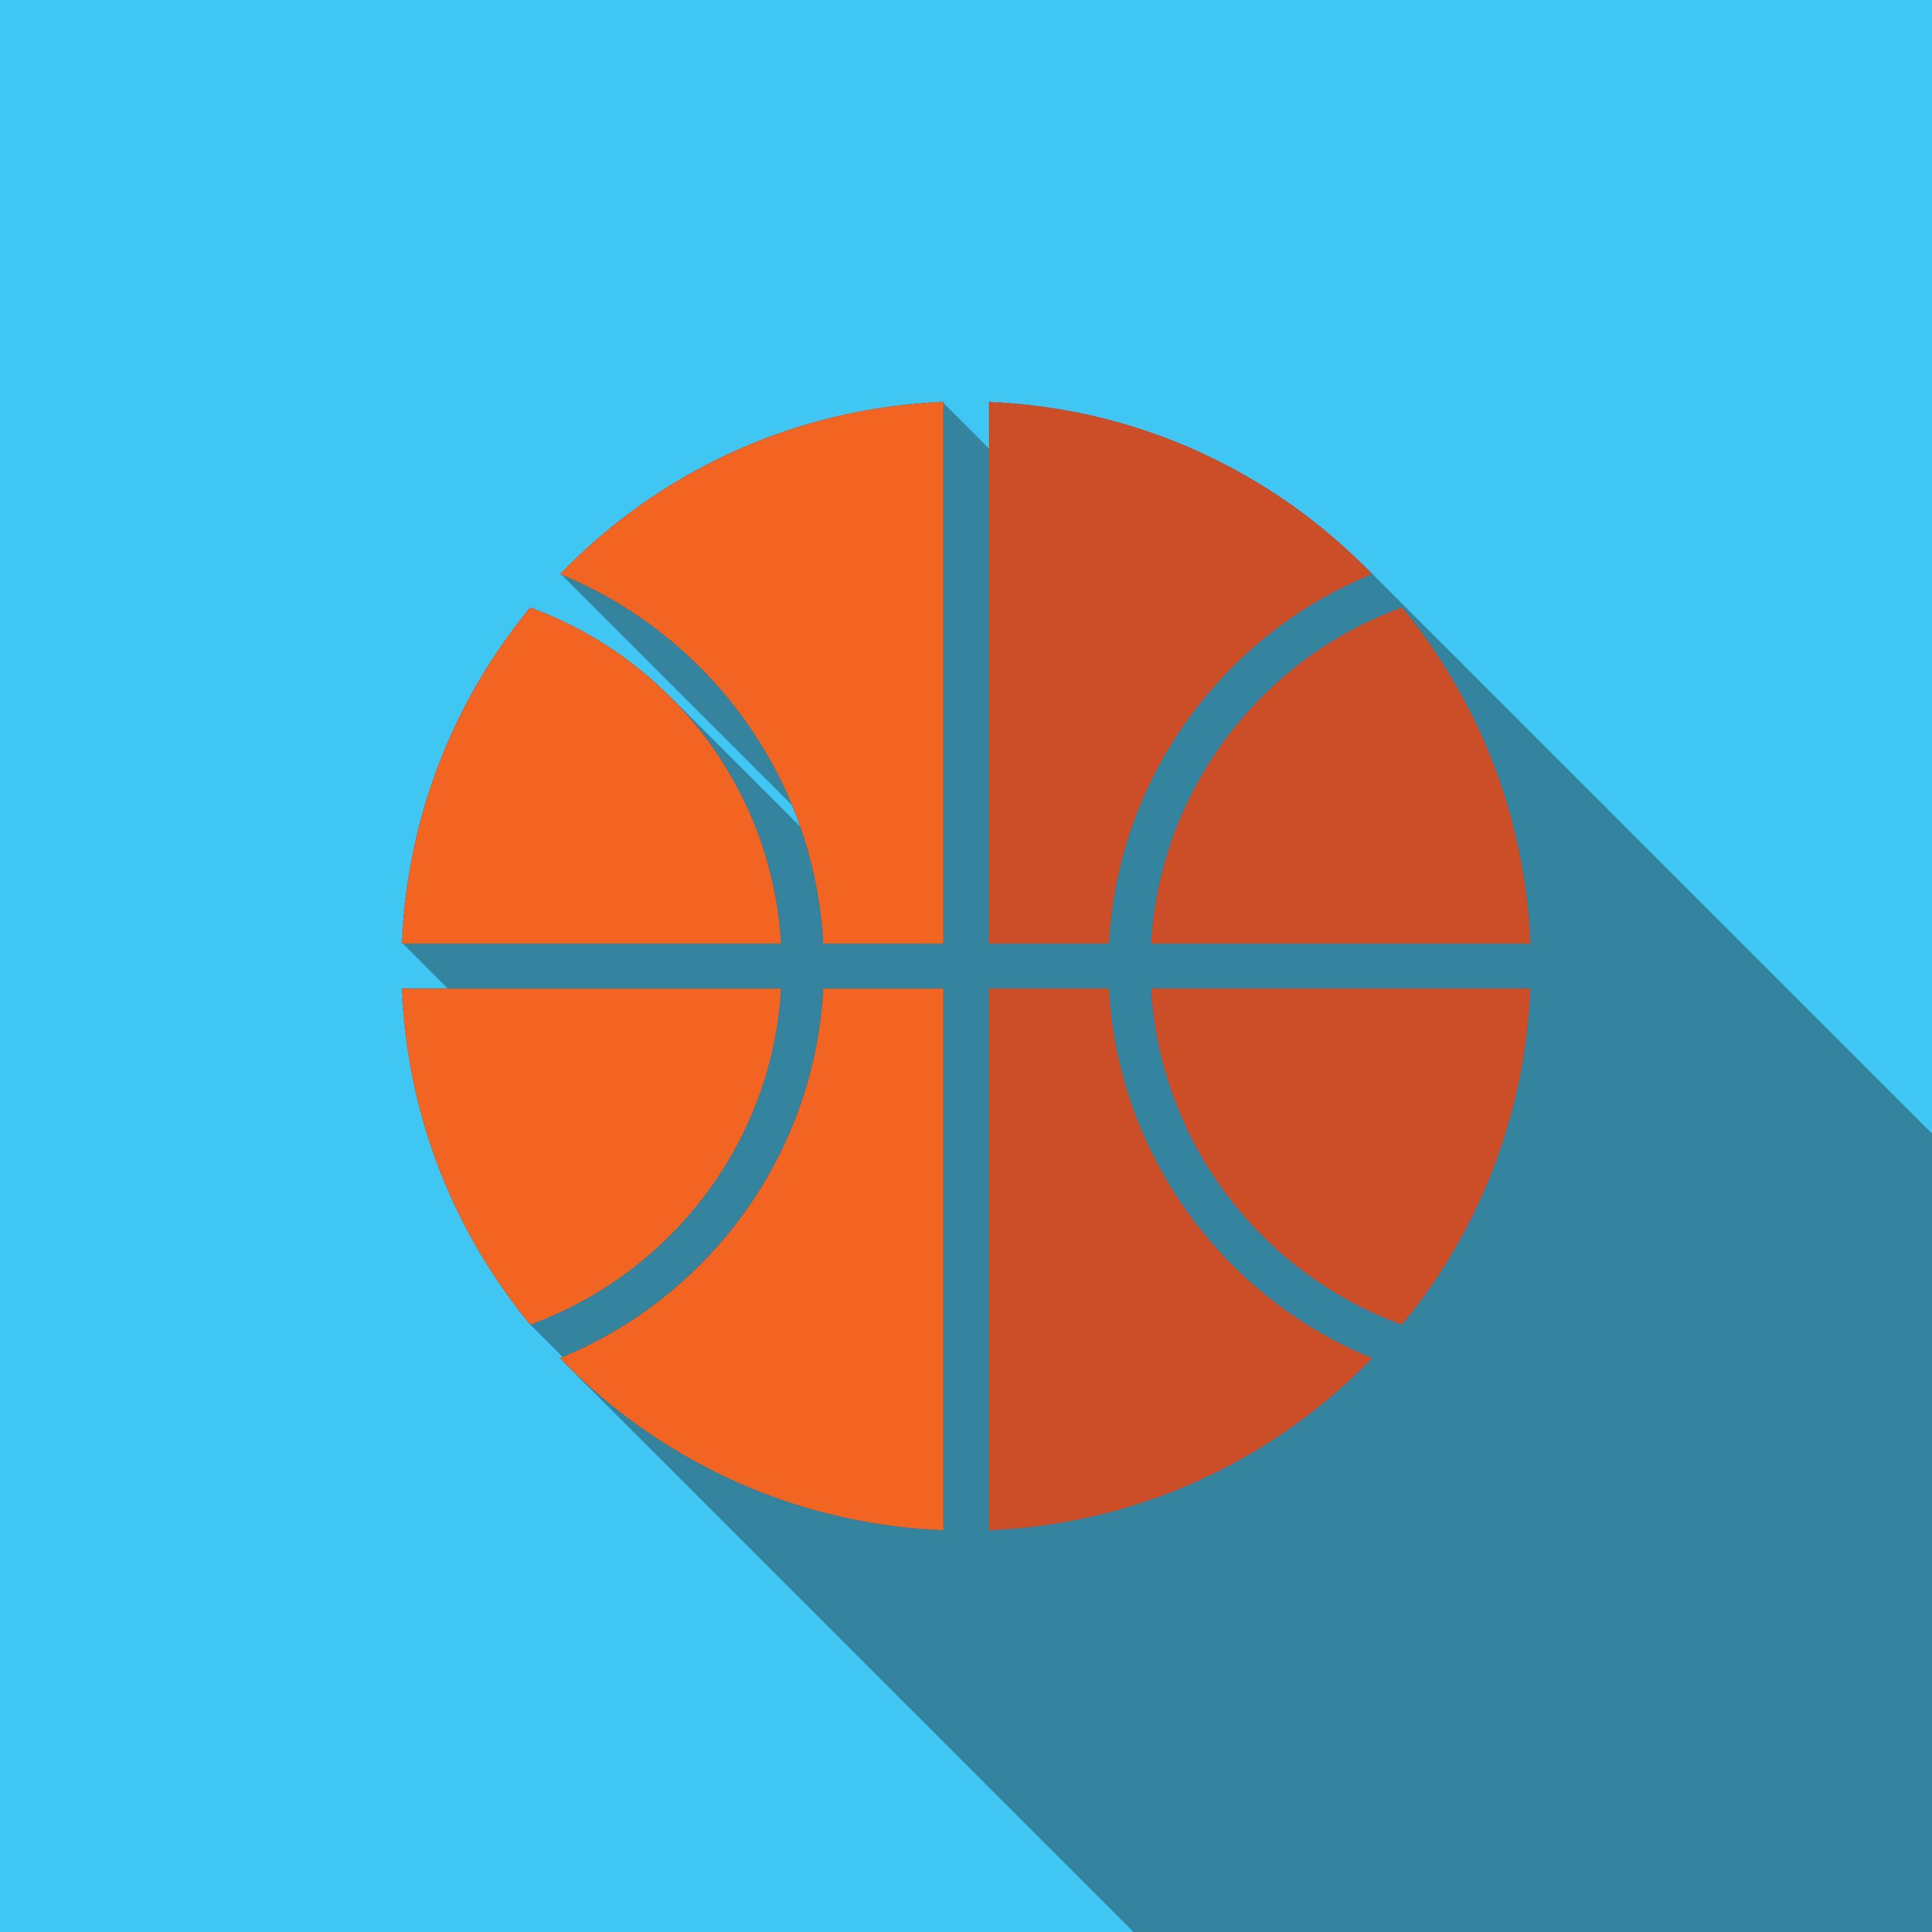 basketball | Flat icon, Pie chart, Flat design